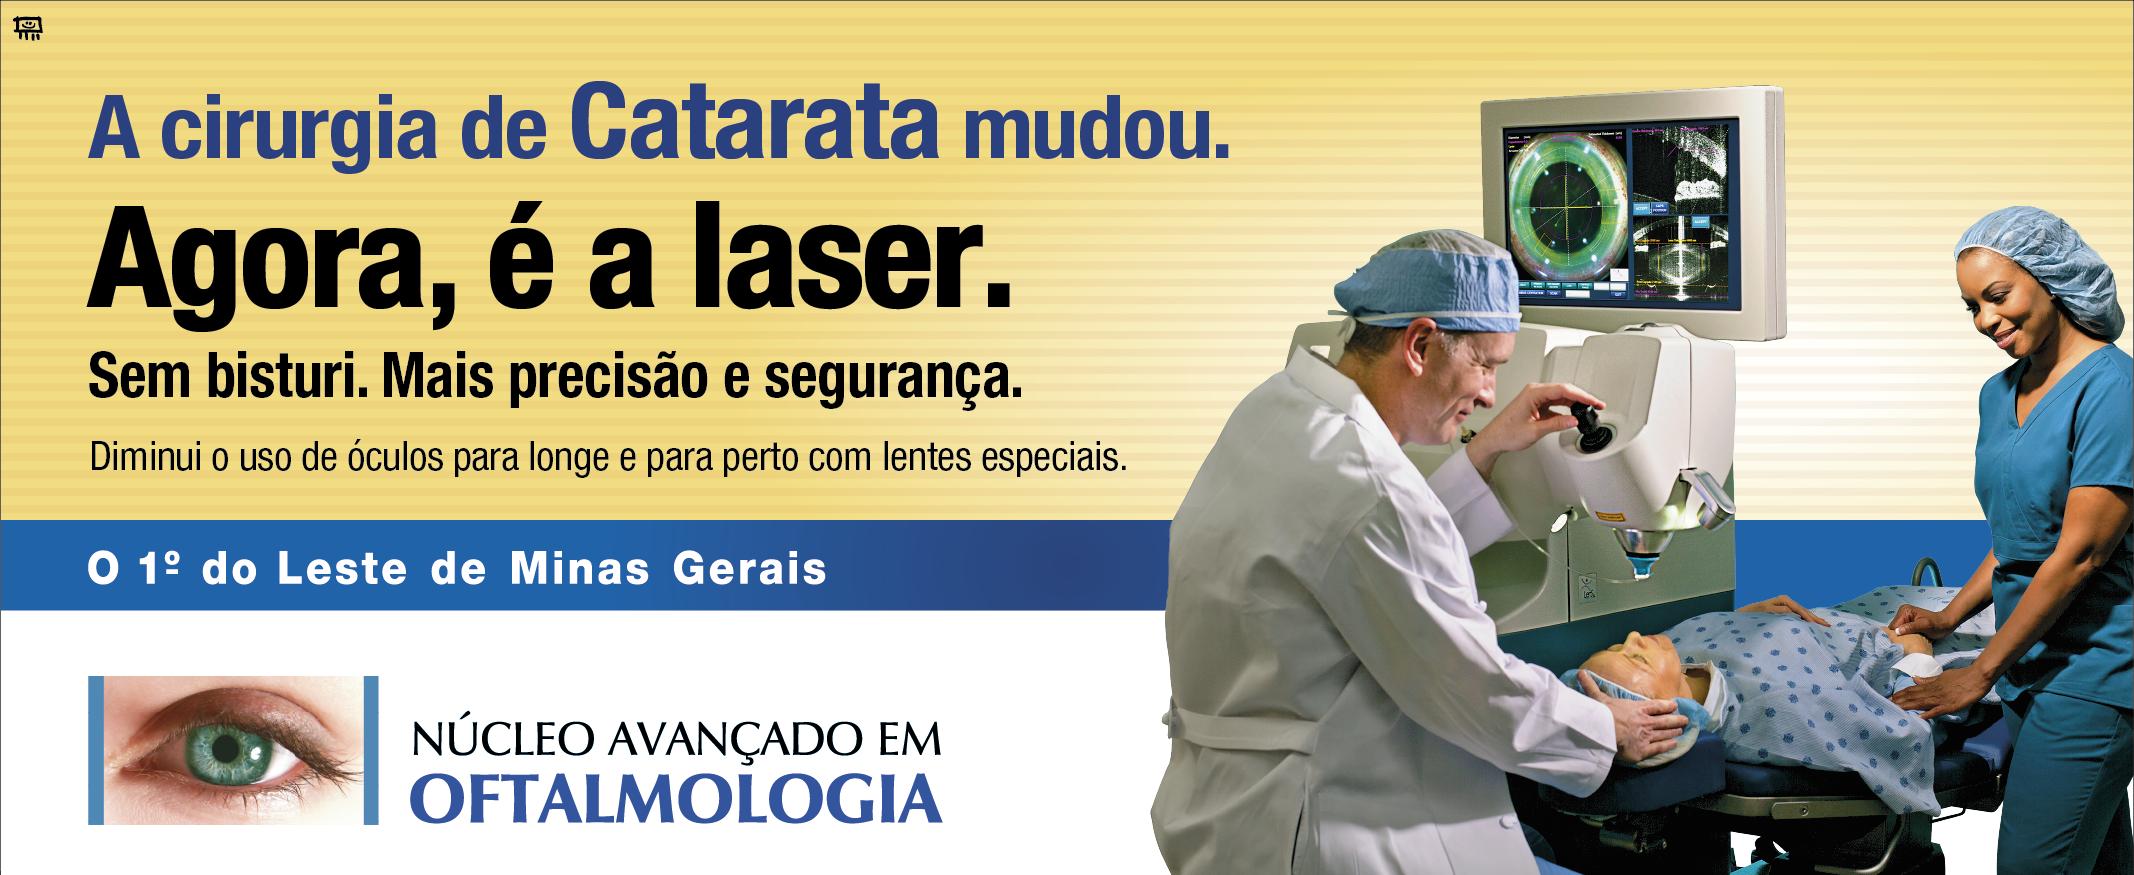 cirurgia-de-catarata-nucleo_avancado_oftalmologia